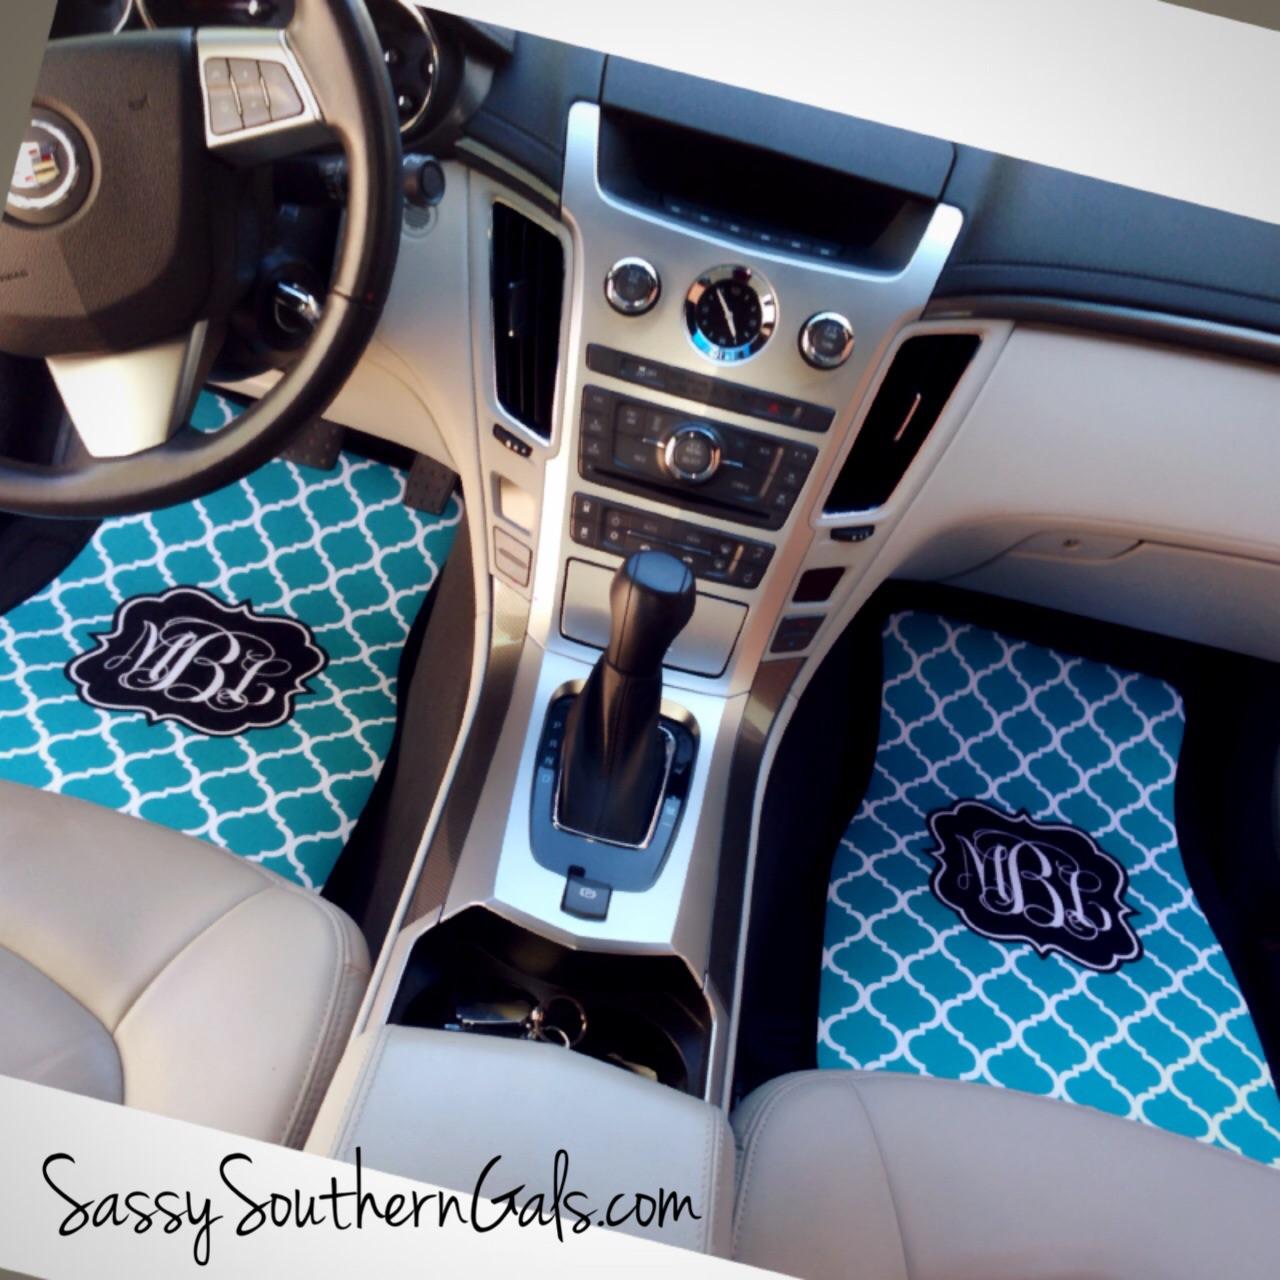 Monogrammed Floor Mats >> Monogrammed Car Mats Personalized Car Mats